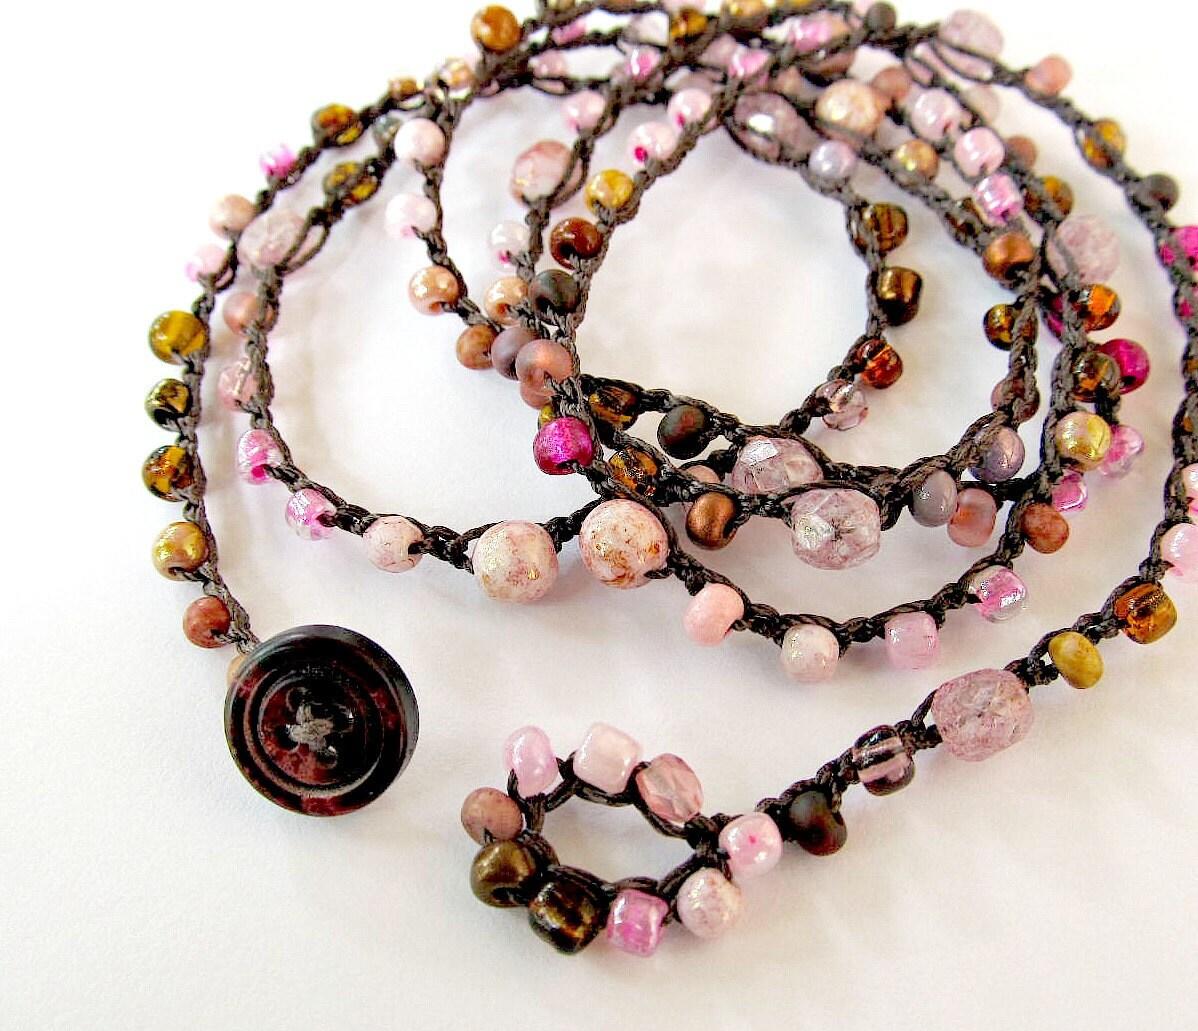 Necklace Beads: Crochet Wrap Bracelet Or Necklace Beaded Petals